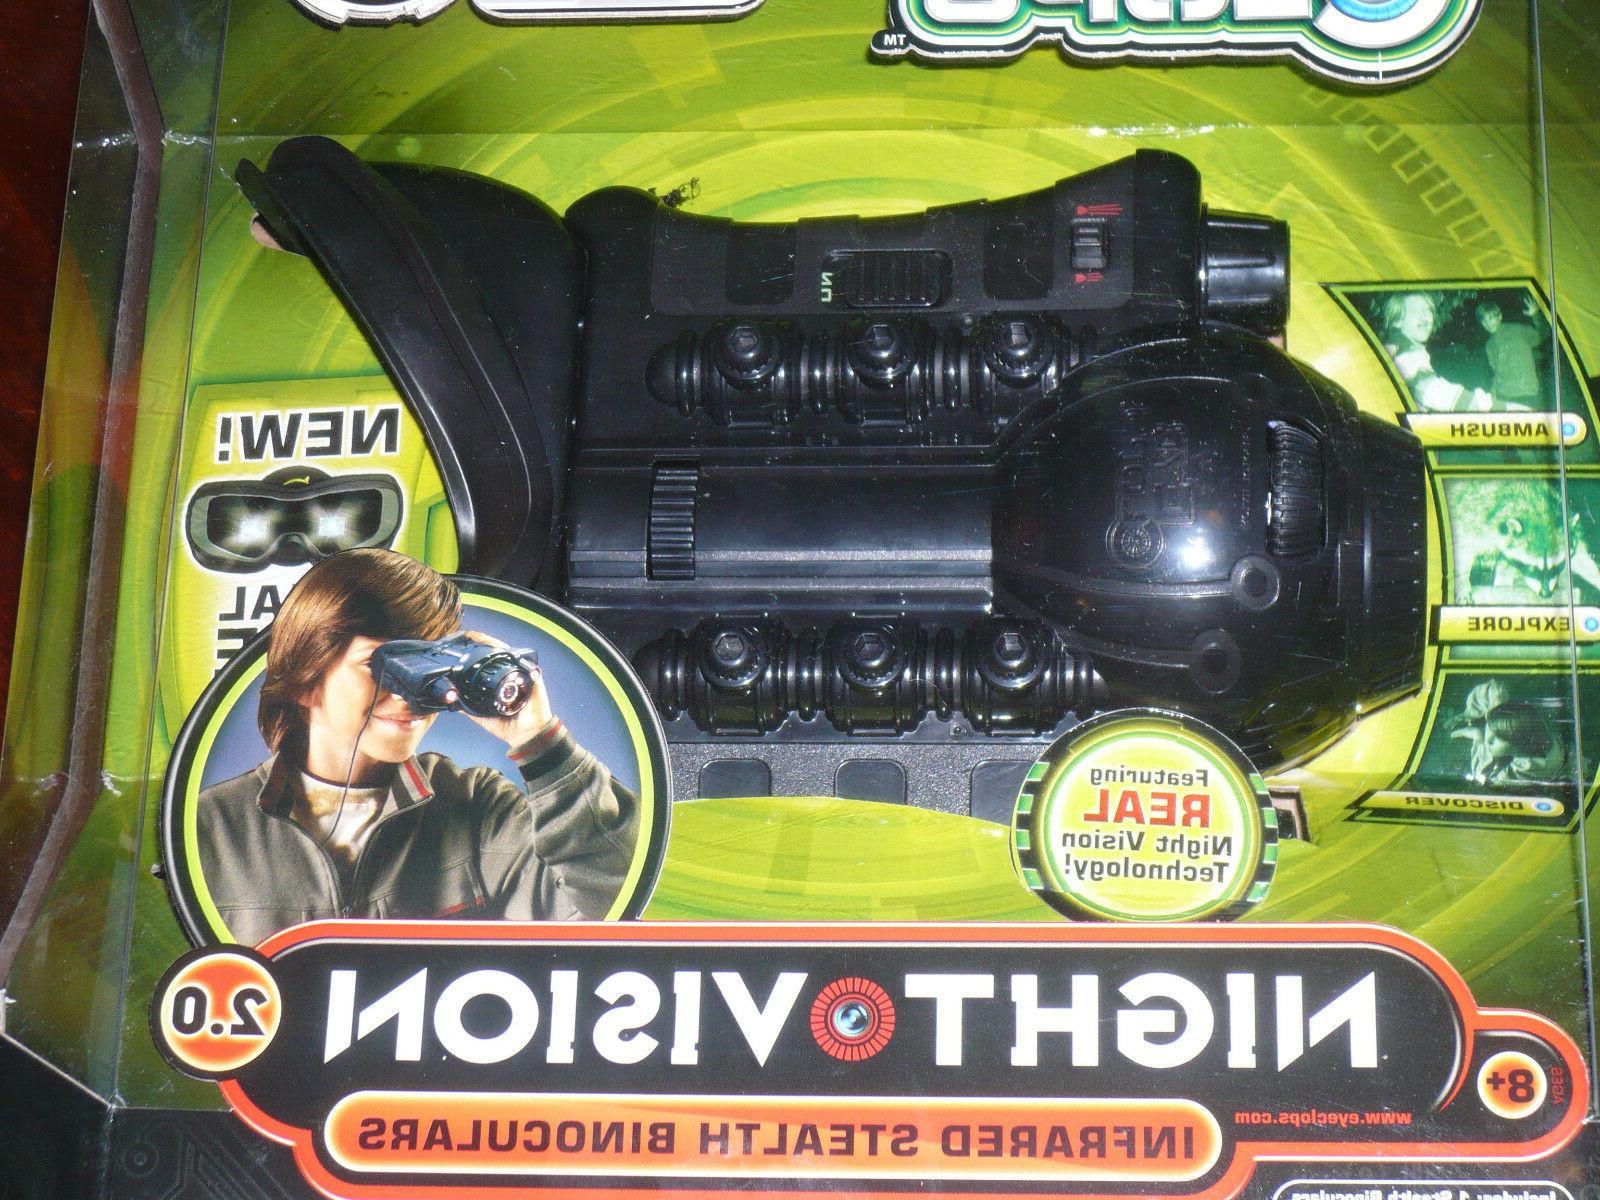 NEW! Jakks Pacific Clops Infrared Stealth Binoculars